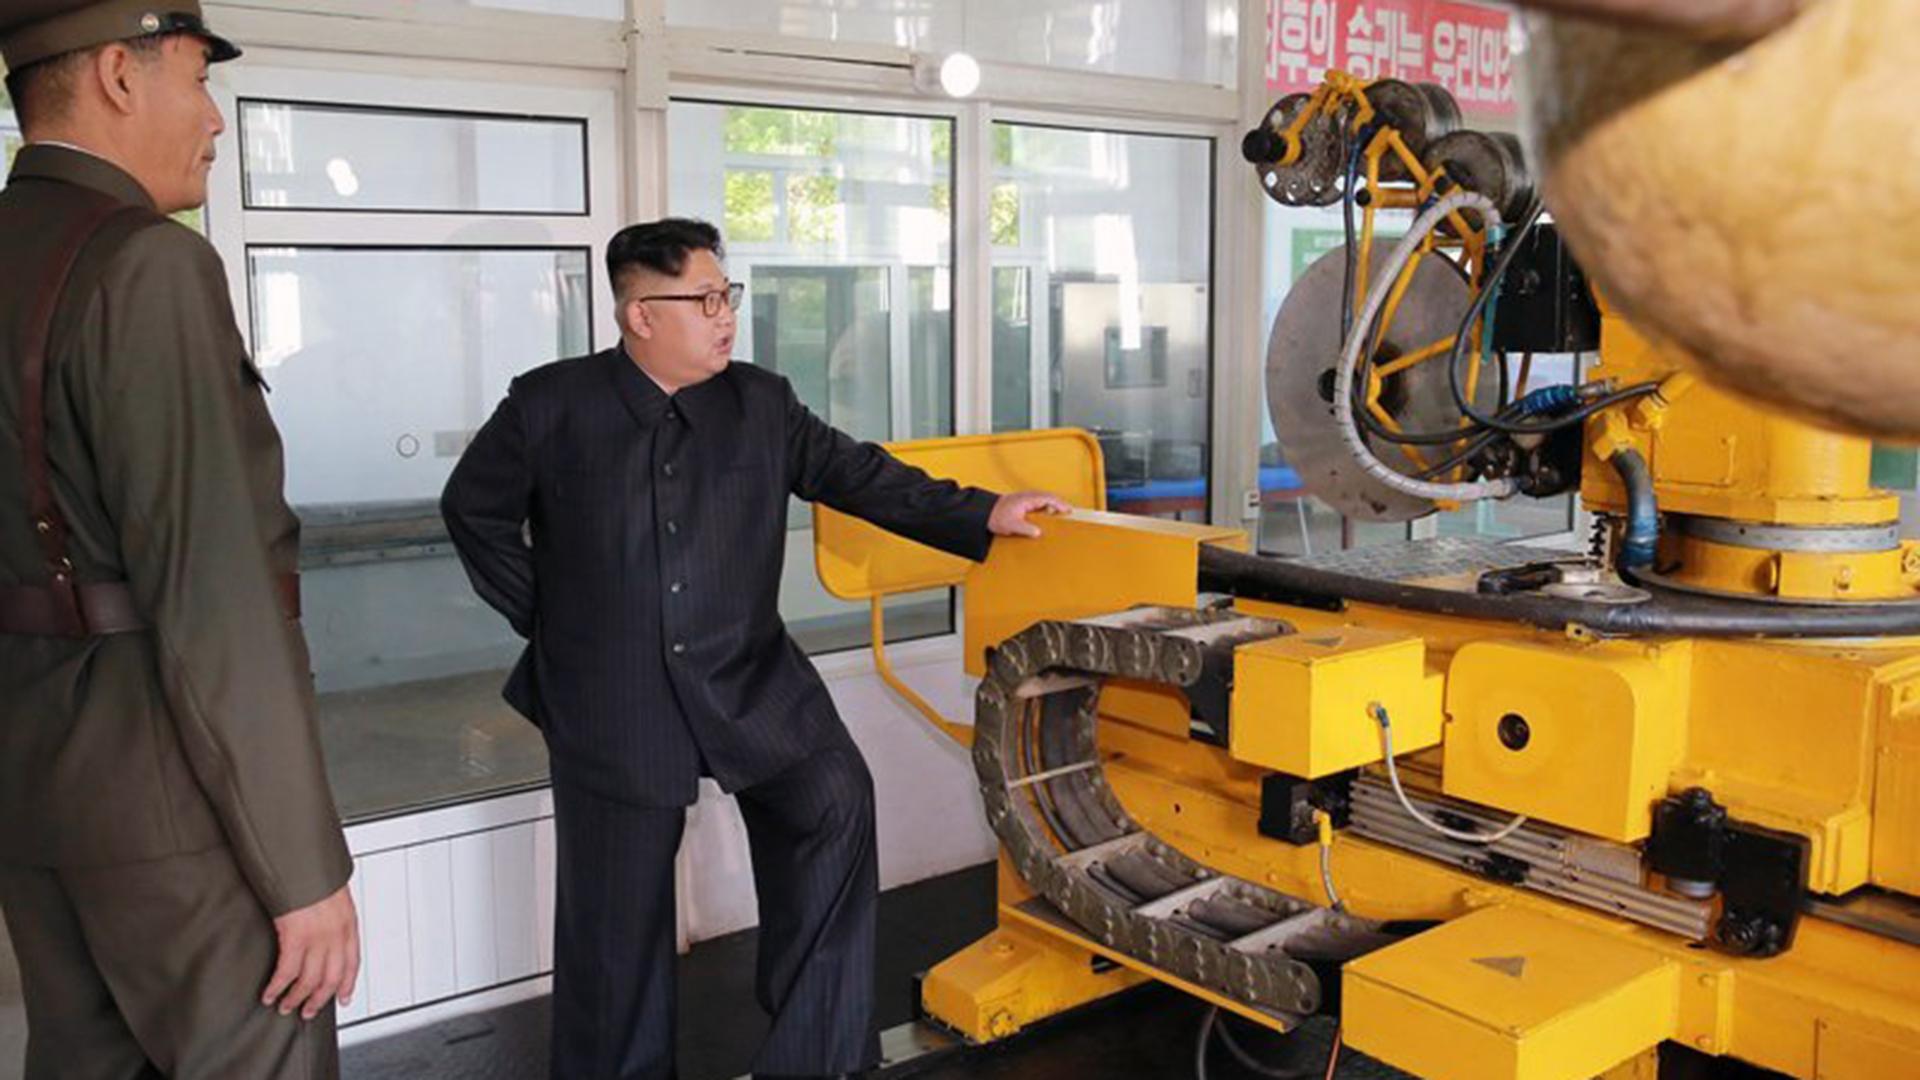 North Korea missiles Kim Jong Un 1-159532.jpg75033532